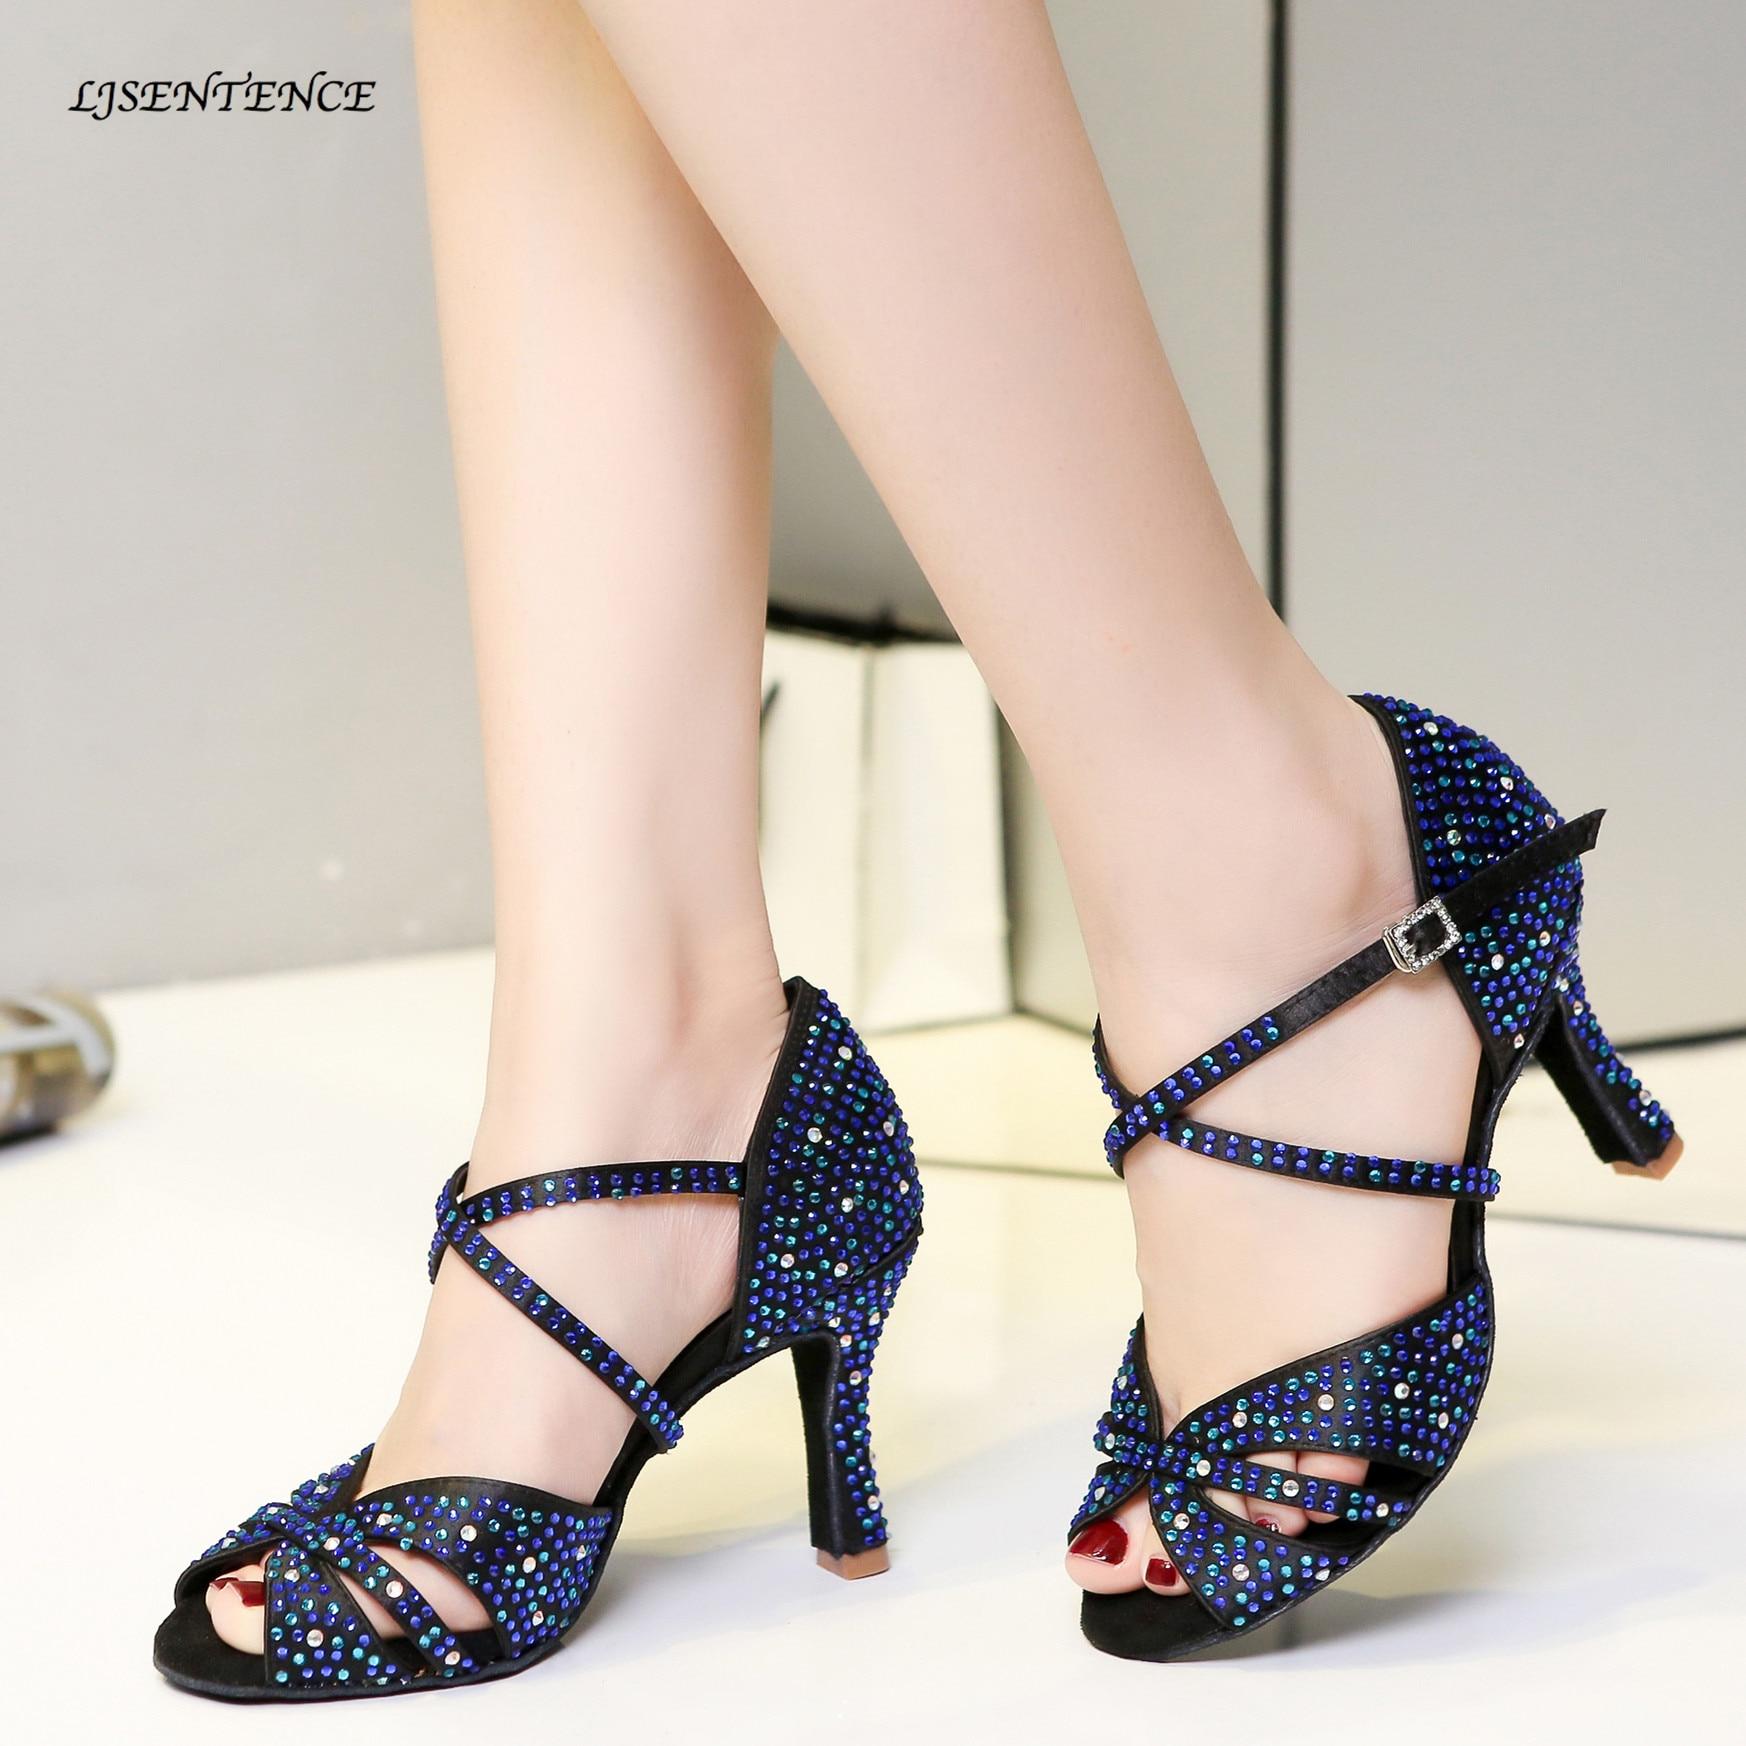 LJSENTENCE Latest Latin Dance Shoes Women Rhinestone Salsa Glitter Ballroom Sandals Shine Blue Color Height Dance Heels L382